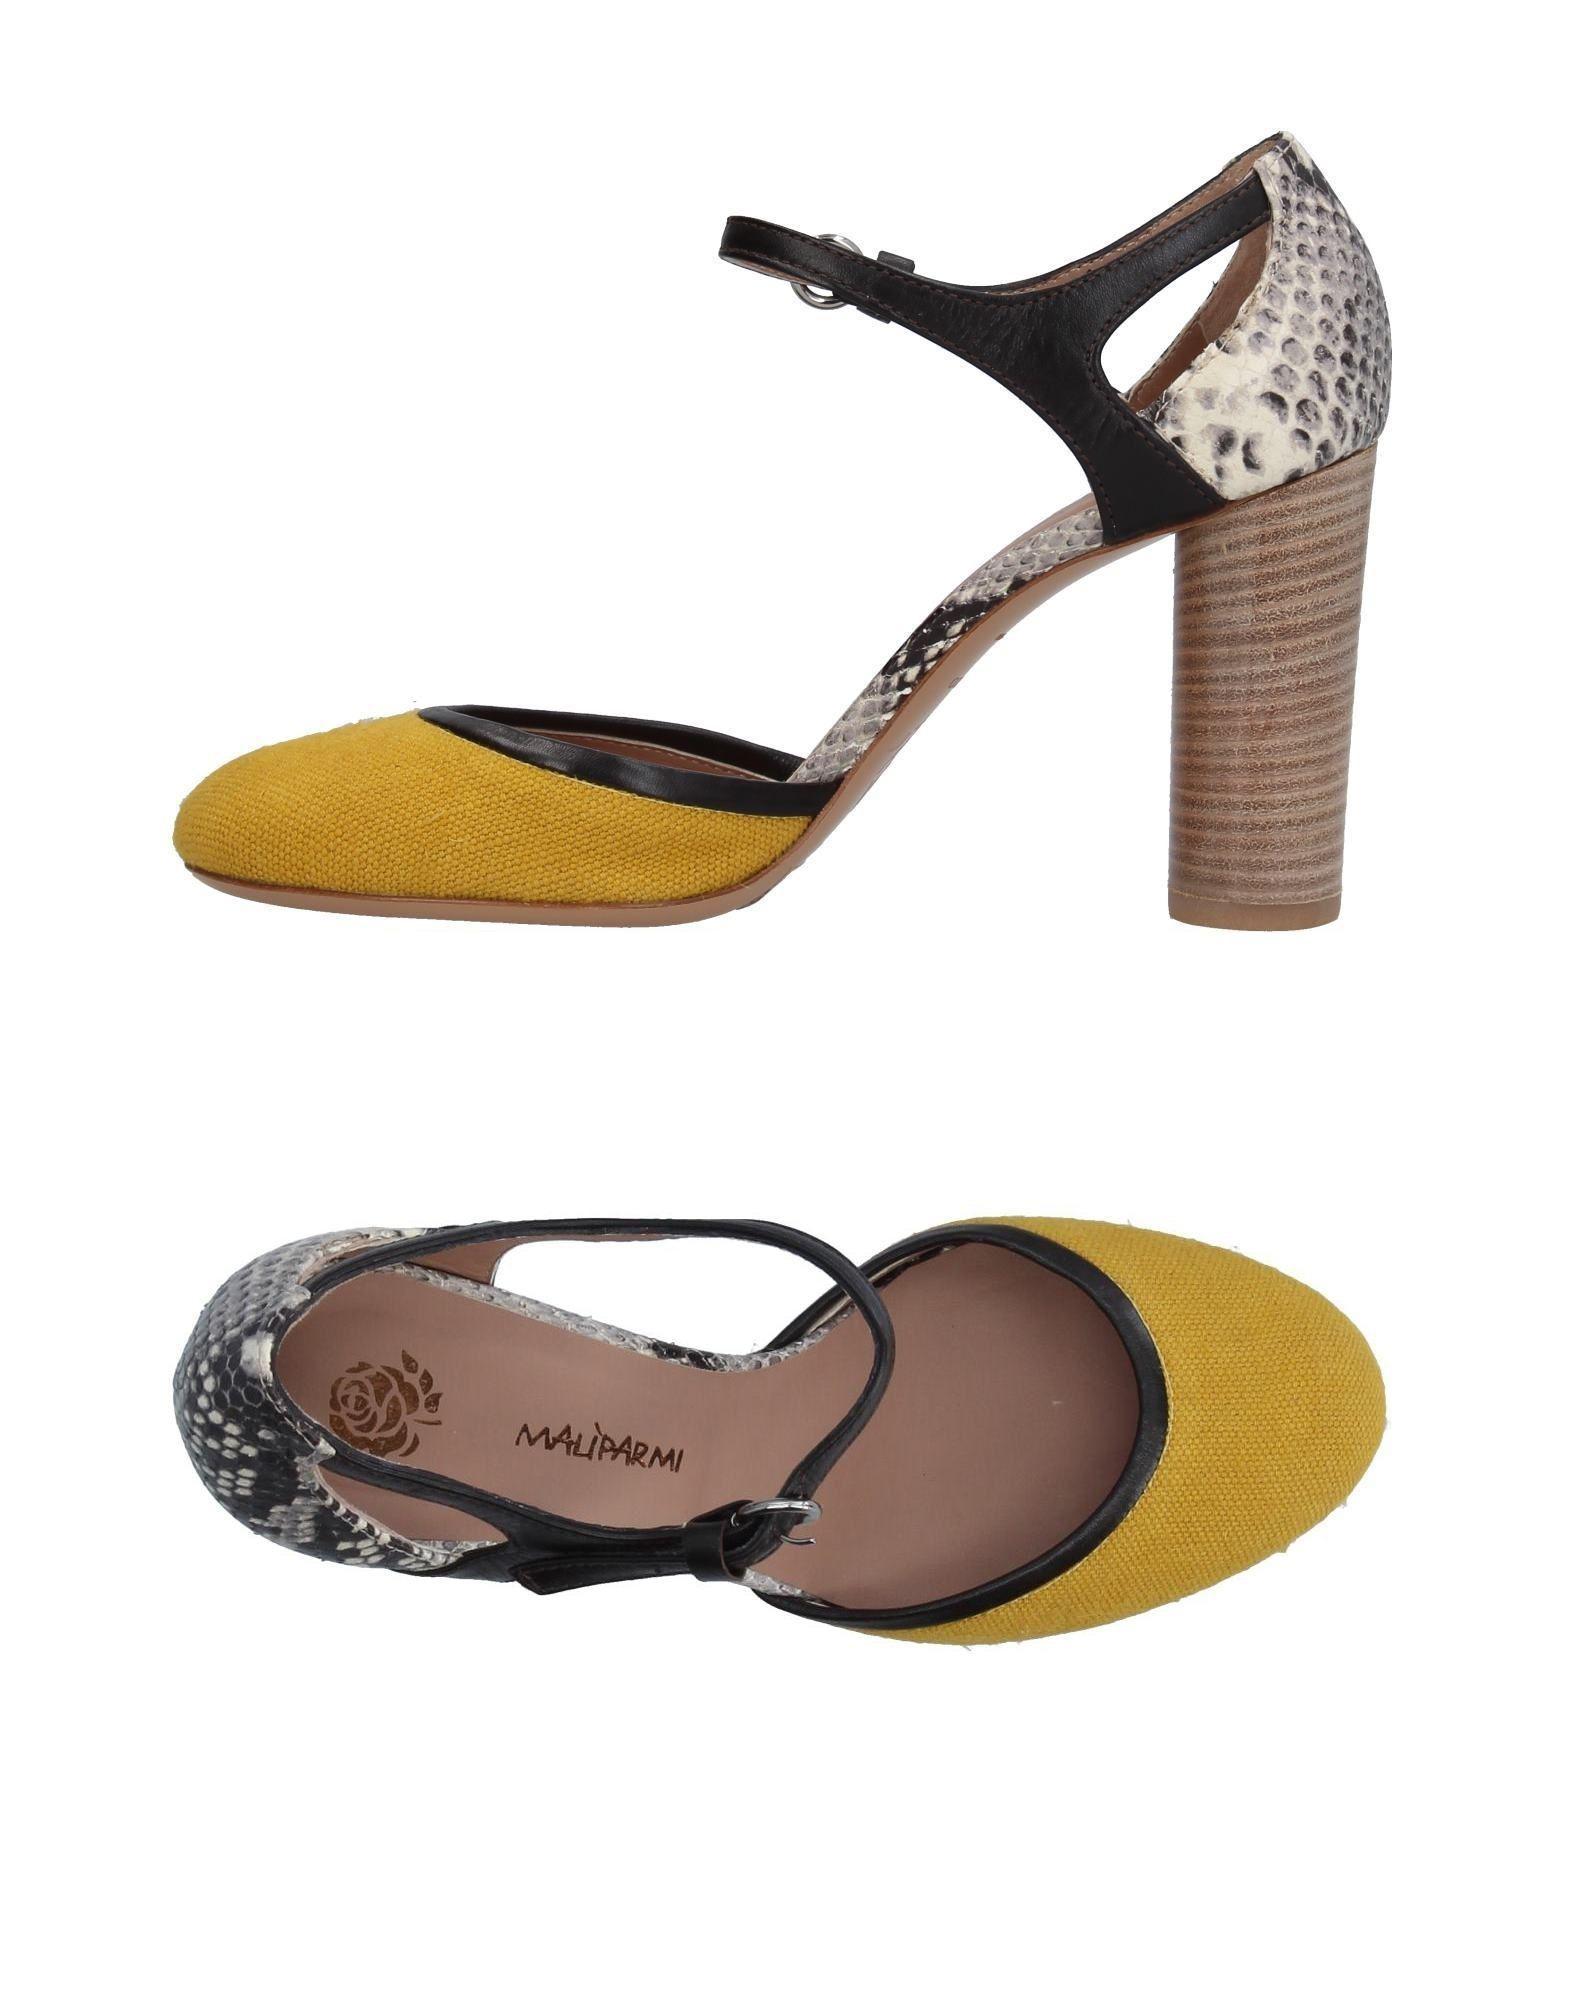 FOOTWEAR - Courts Maliparmi xEQ0A49a2d